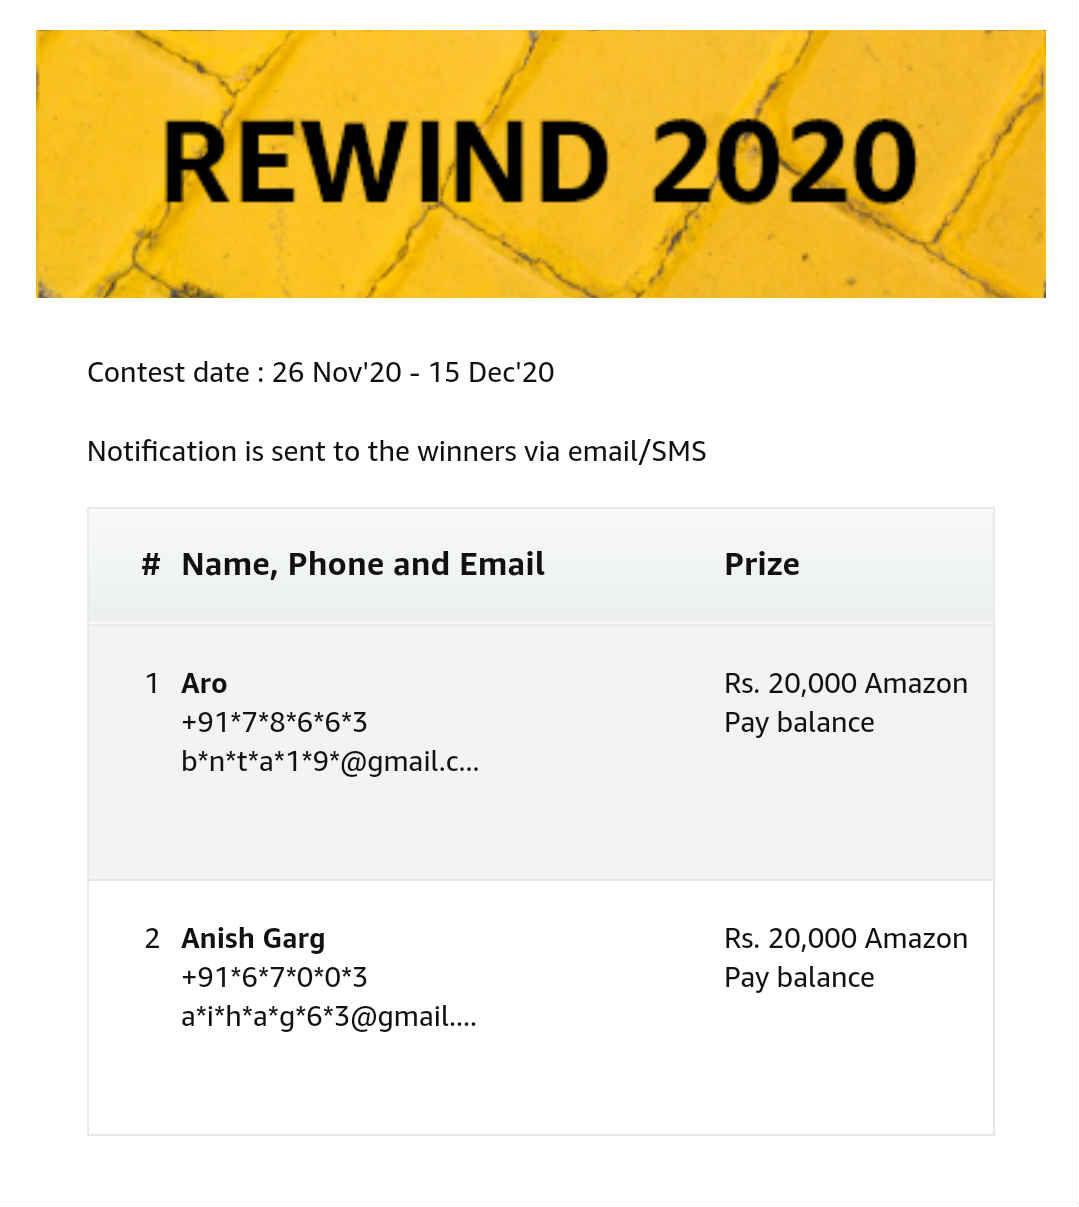 Amazon Rewind 2020